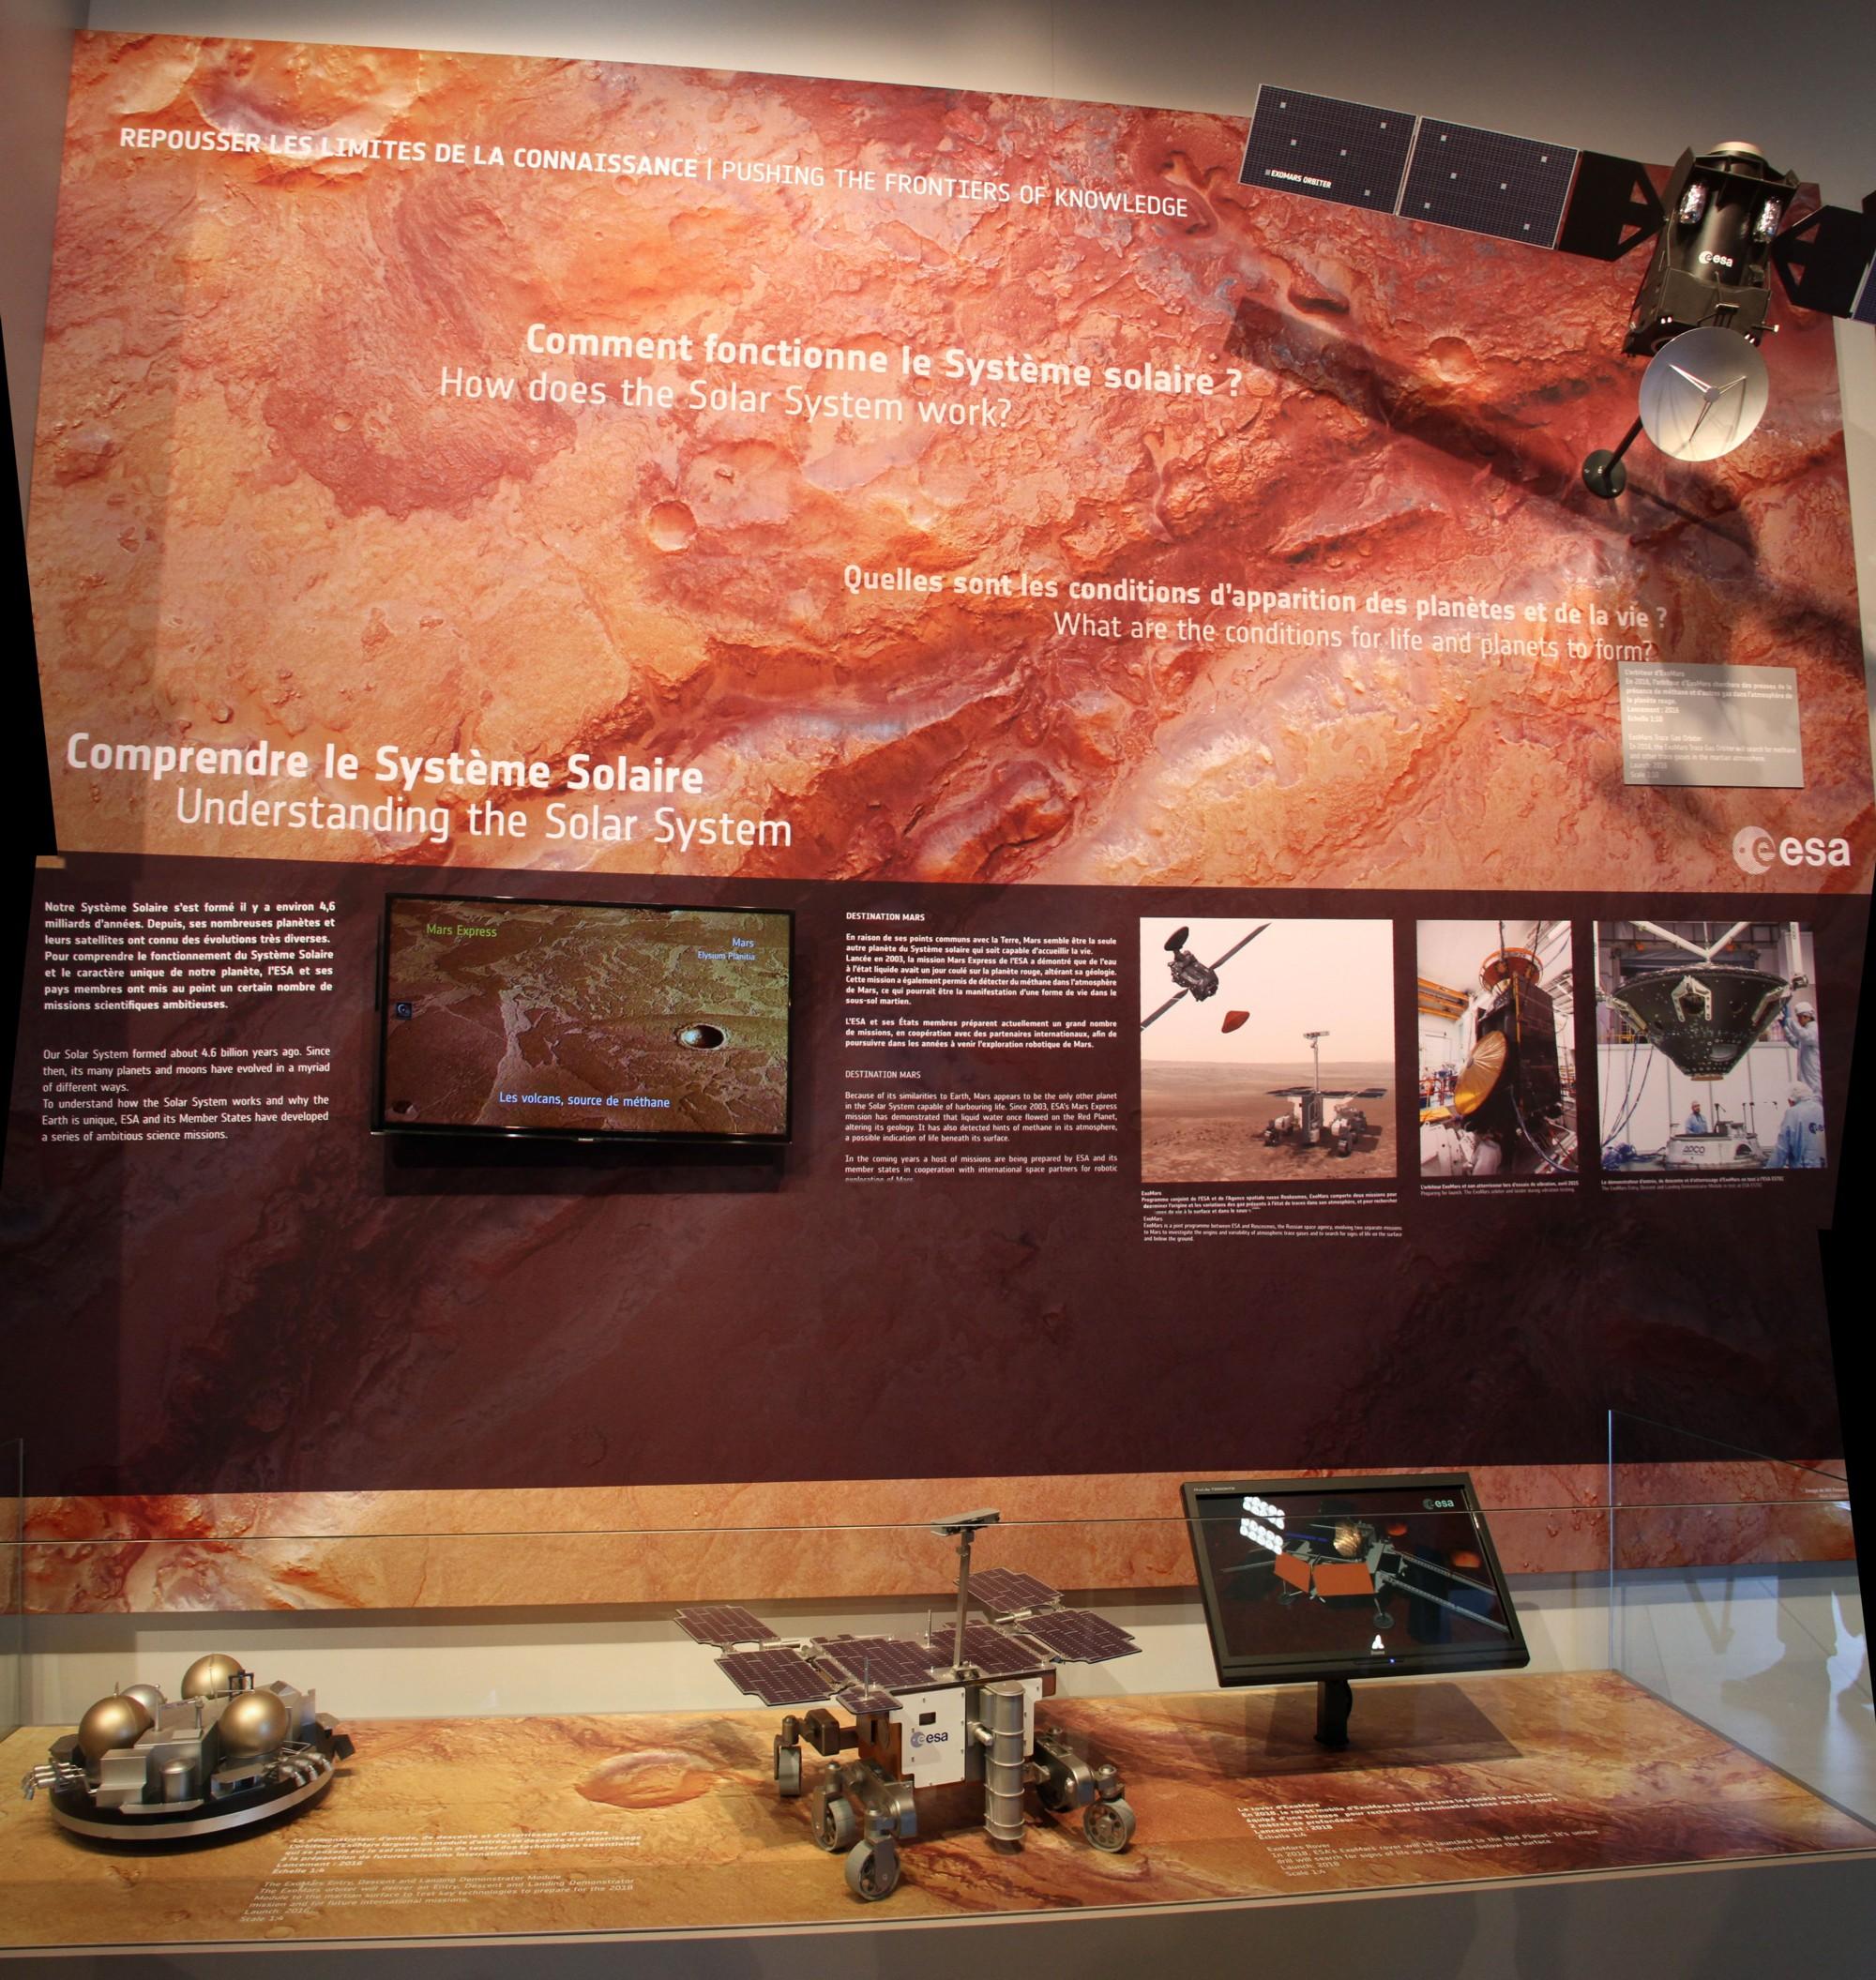 15 06 16 - 11h 15m 32s - Bourget ESA Mars_stitch r